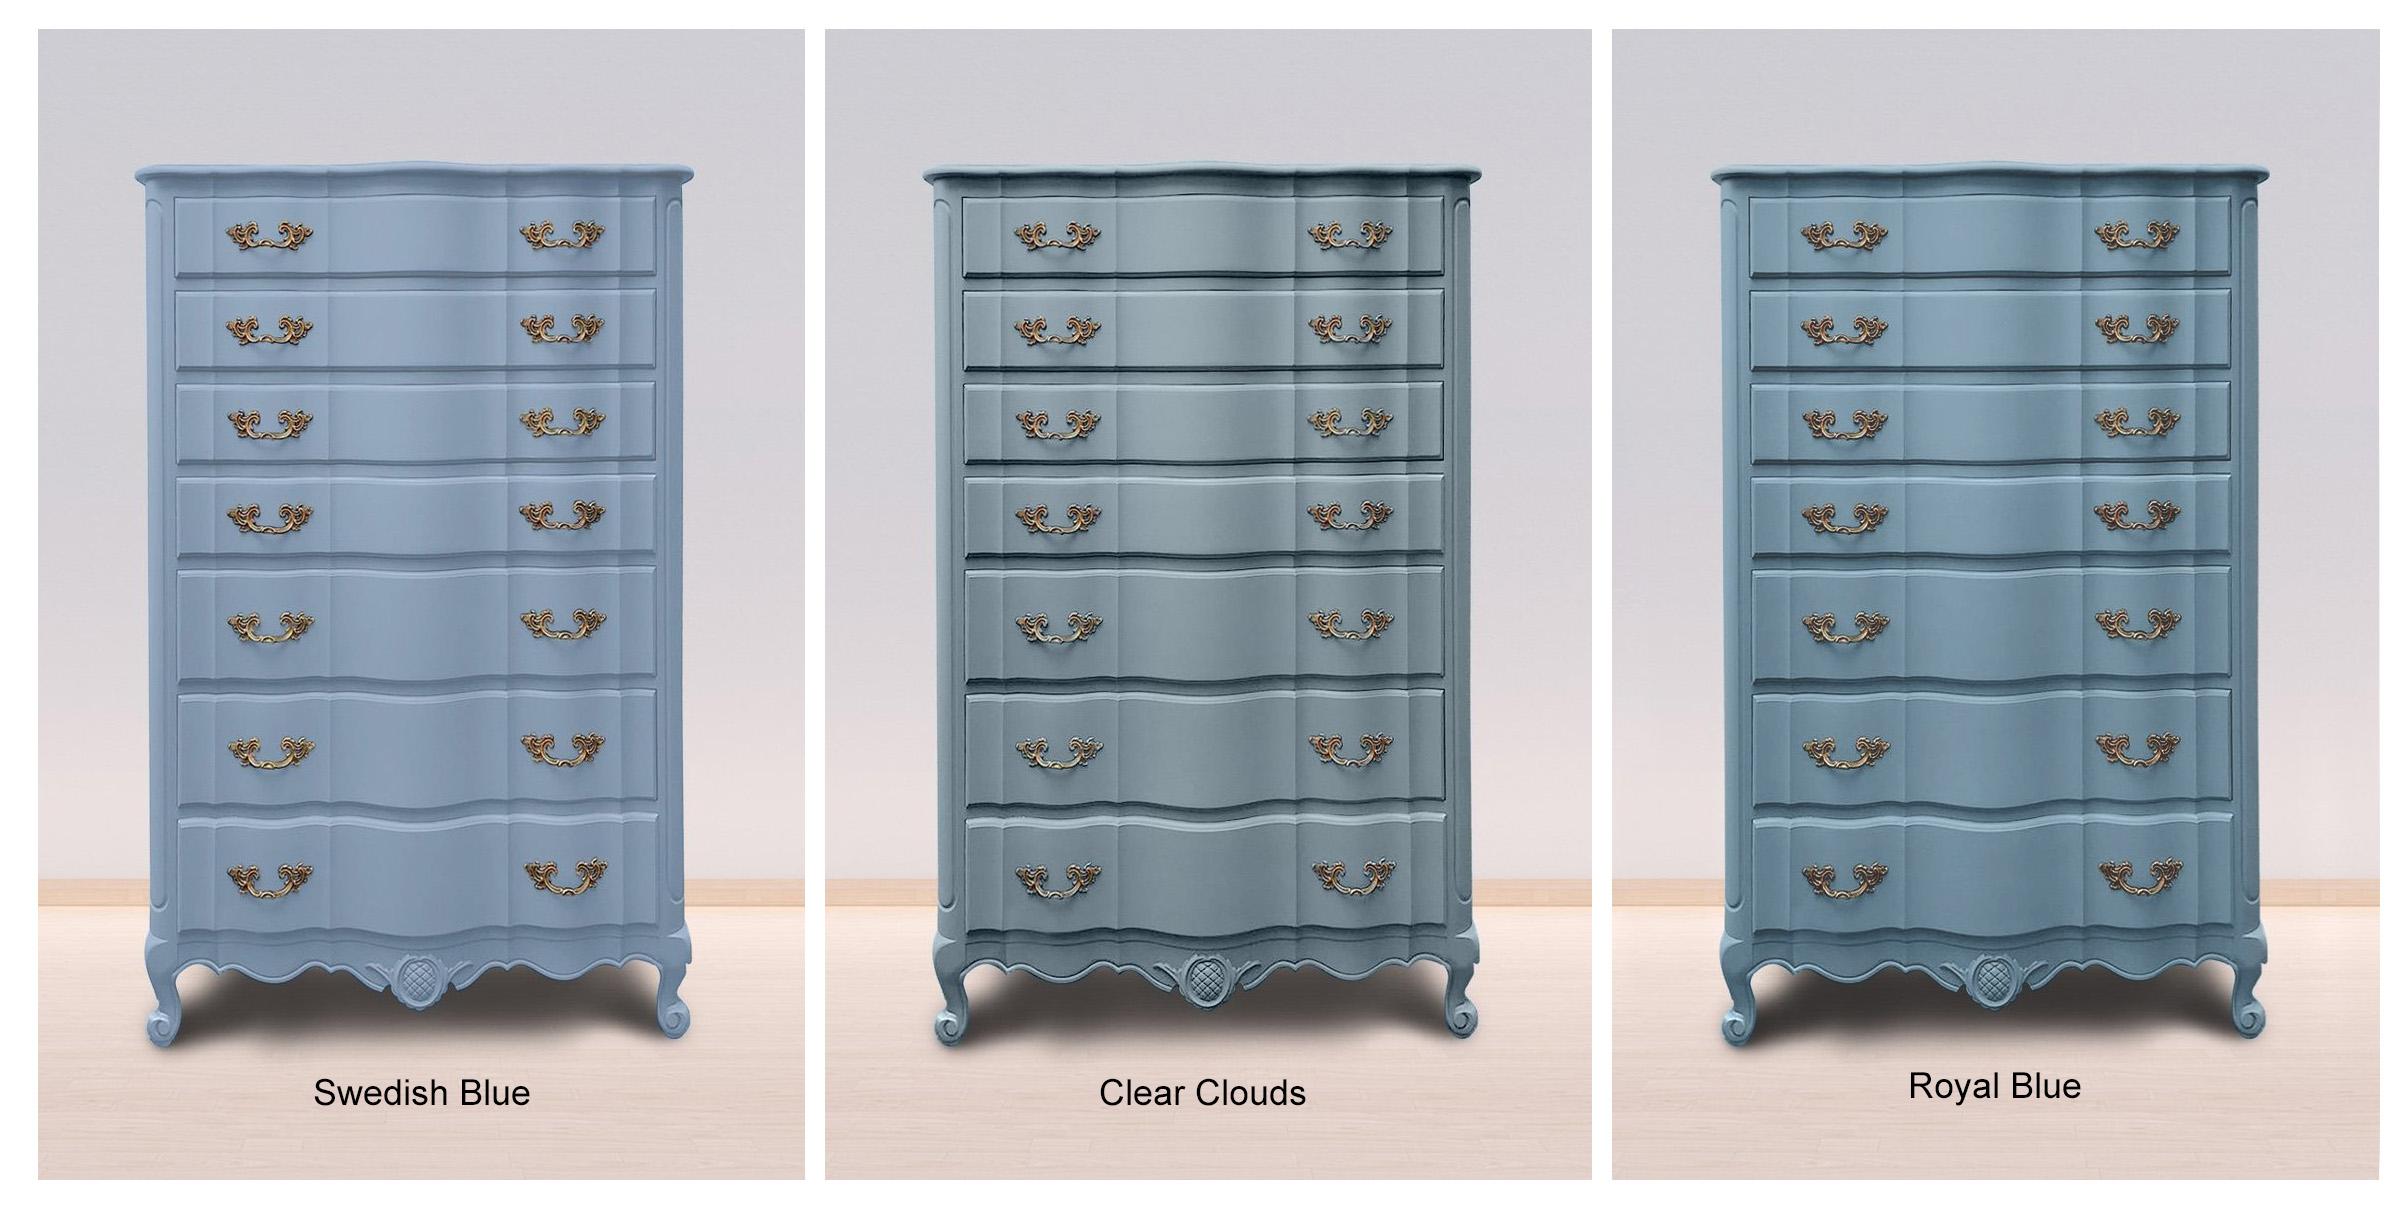 Swedish Blue, Clear Clouds & Royal Blue